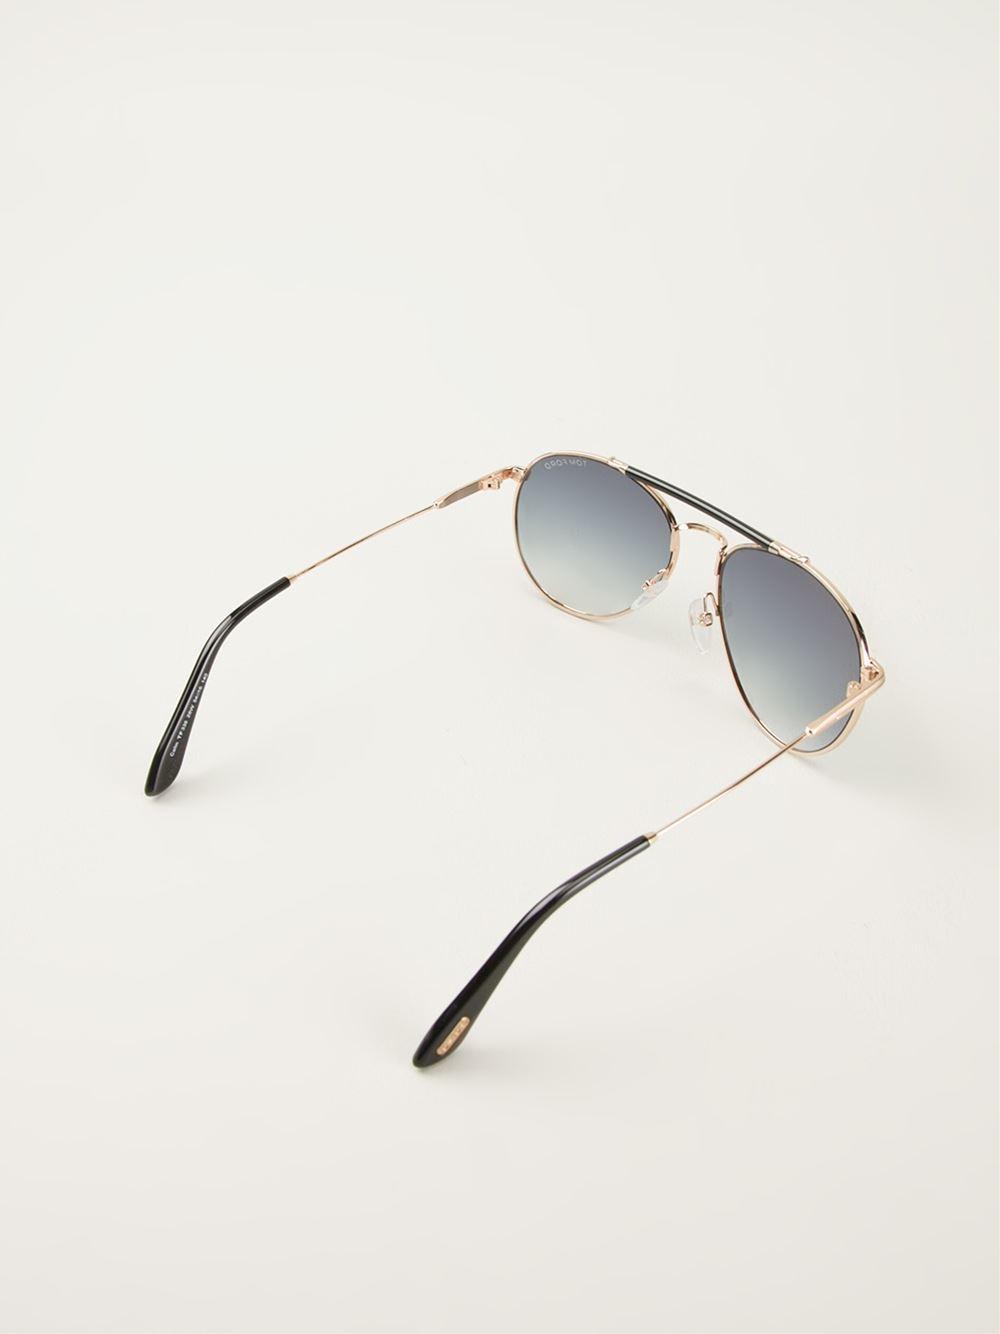 Tom Ford Colin Aviator Sunglasses in Blue for Men